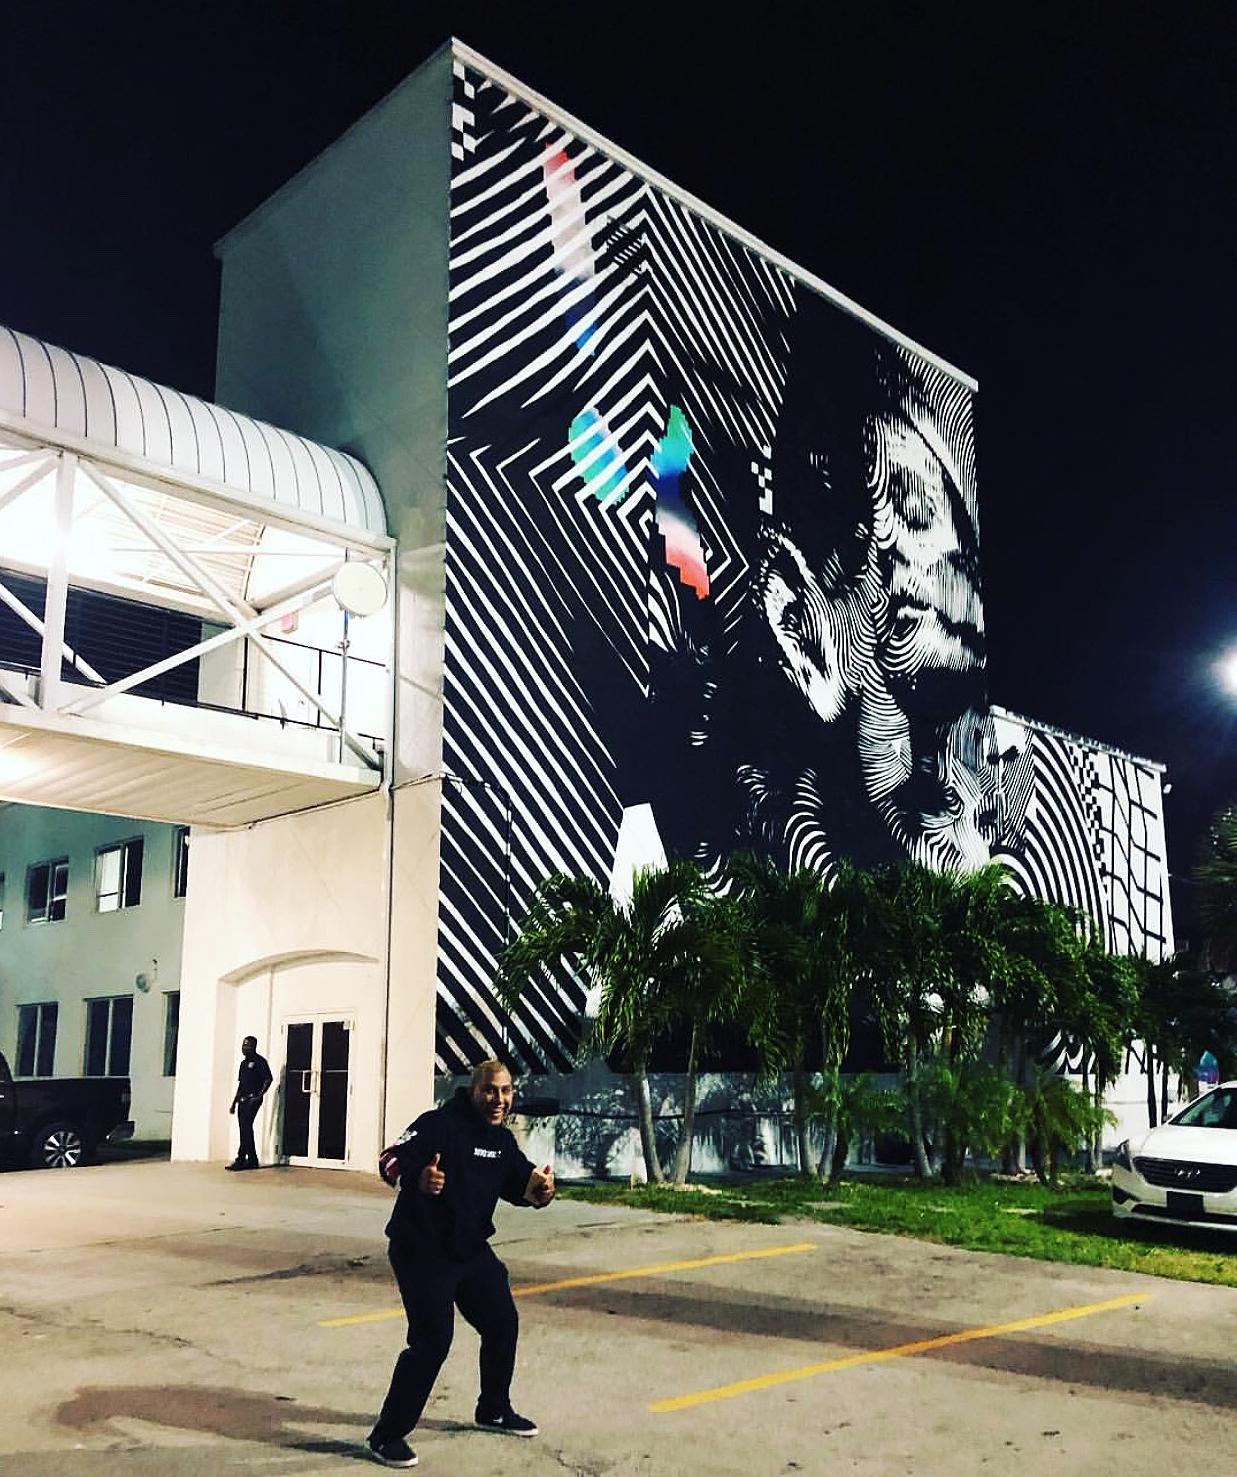 Katie_Kerl_Miami_mural_art_night